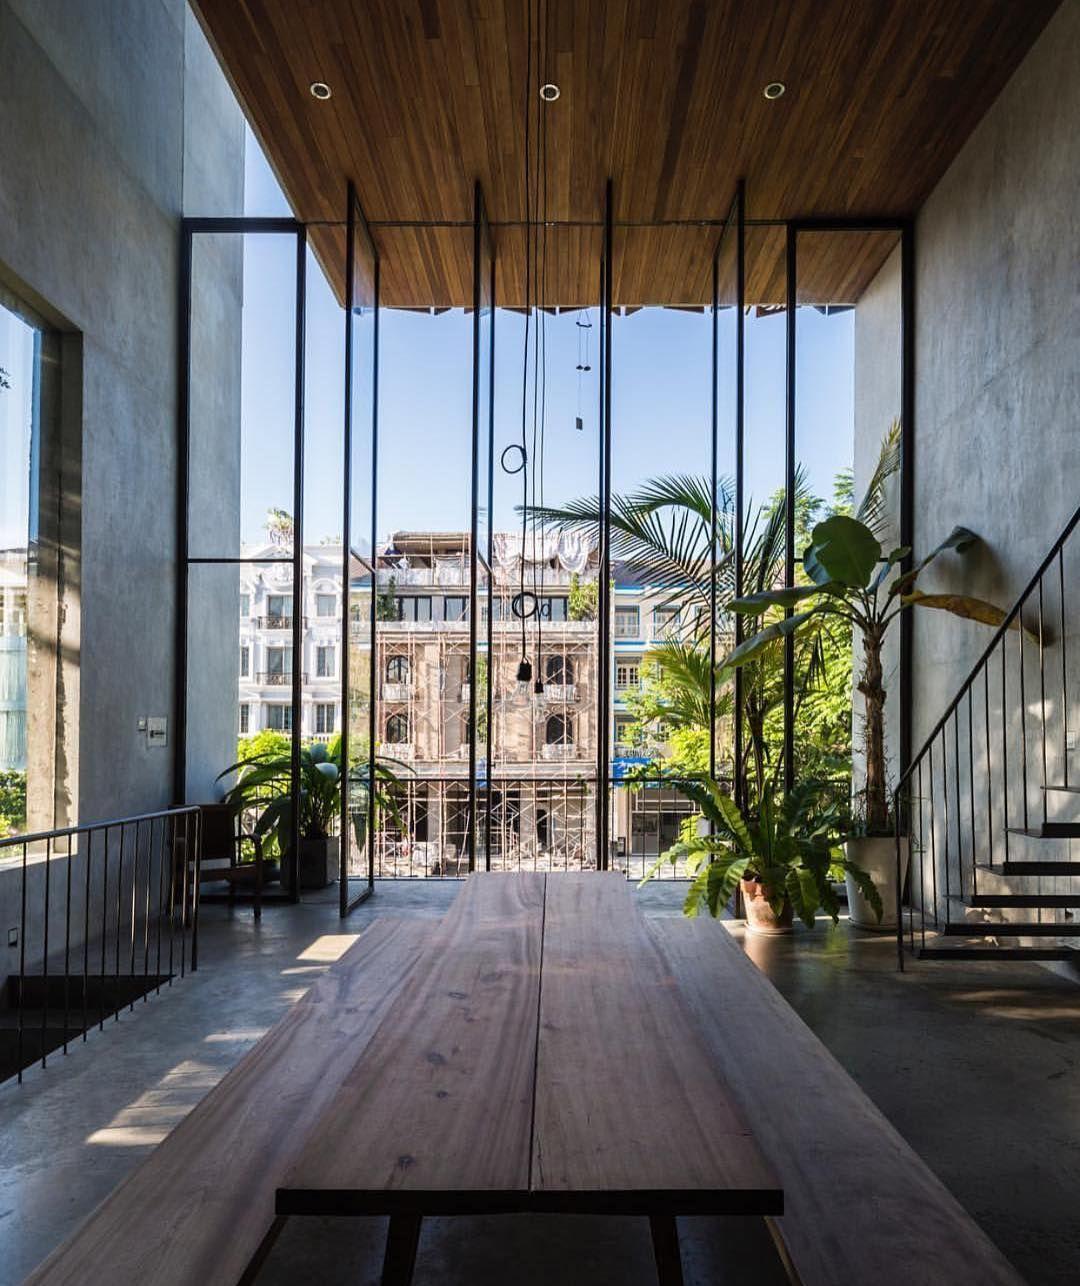 12.7k Likes, 31 Comments - Art & Architecture Magazine (@modern ...